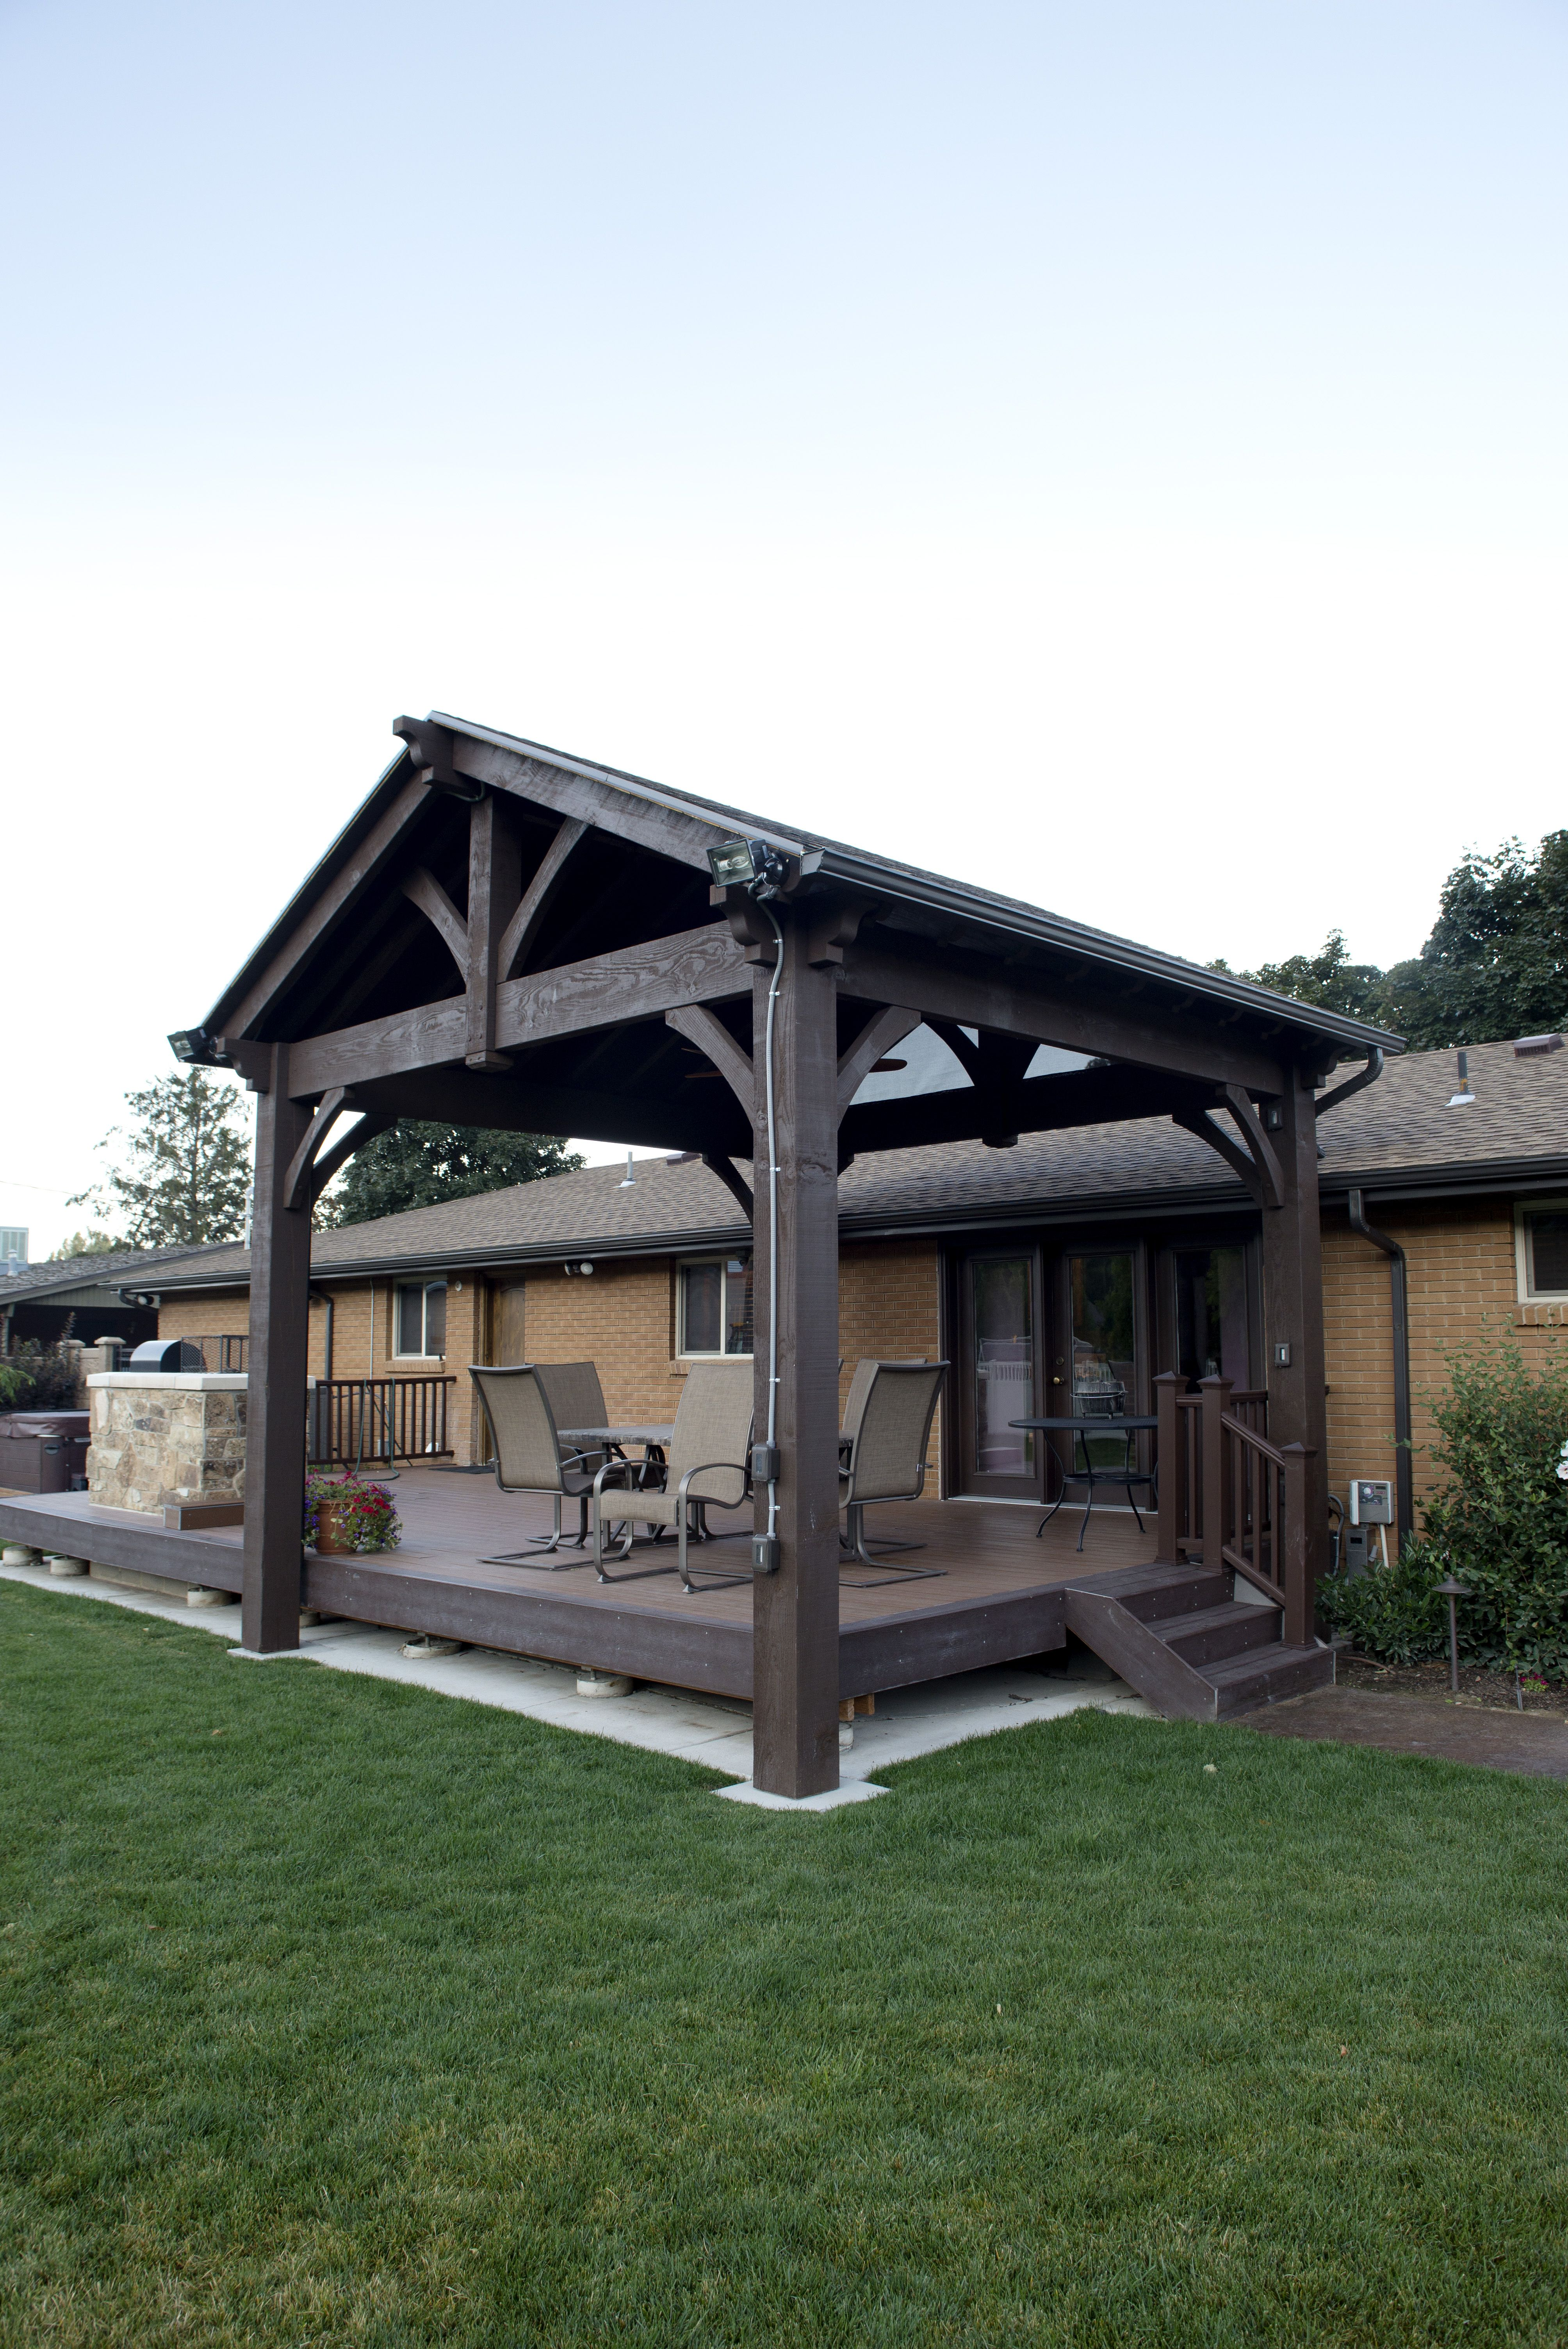 Porch Roof Framing Details | Pro-Built Construction (Deck & Screen ...